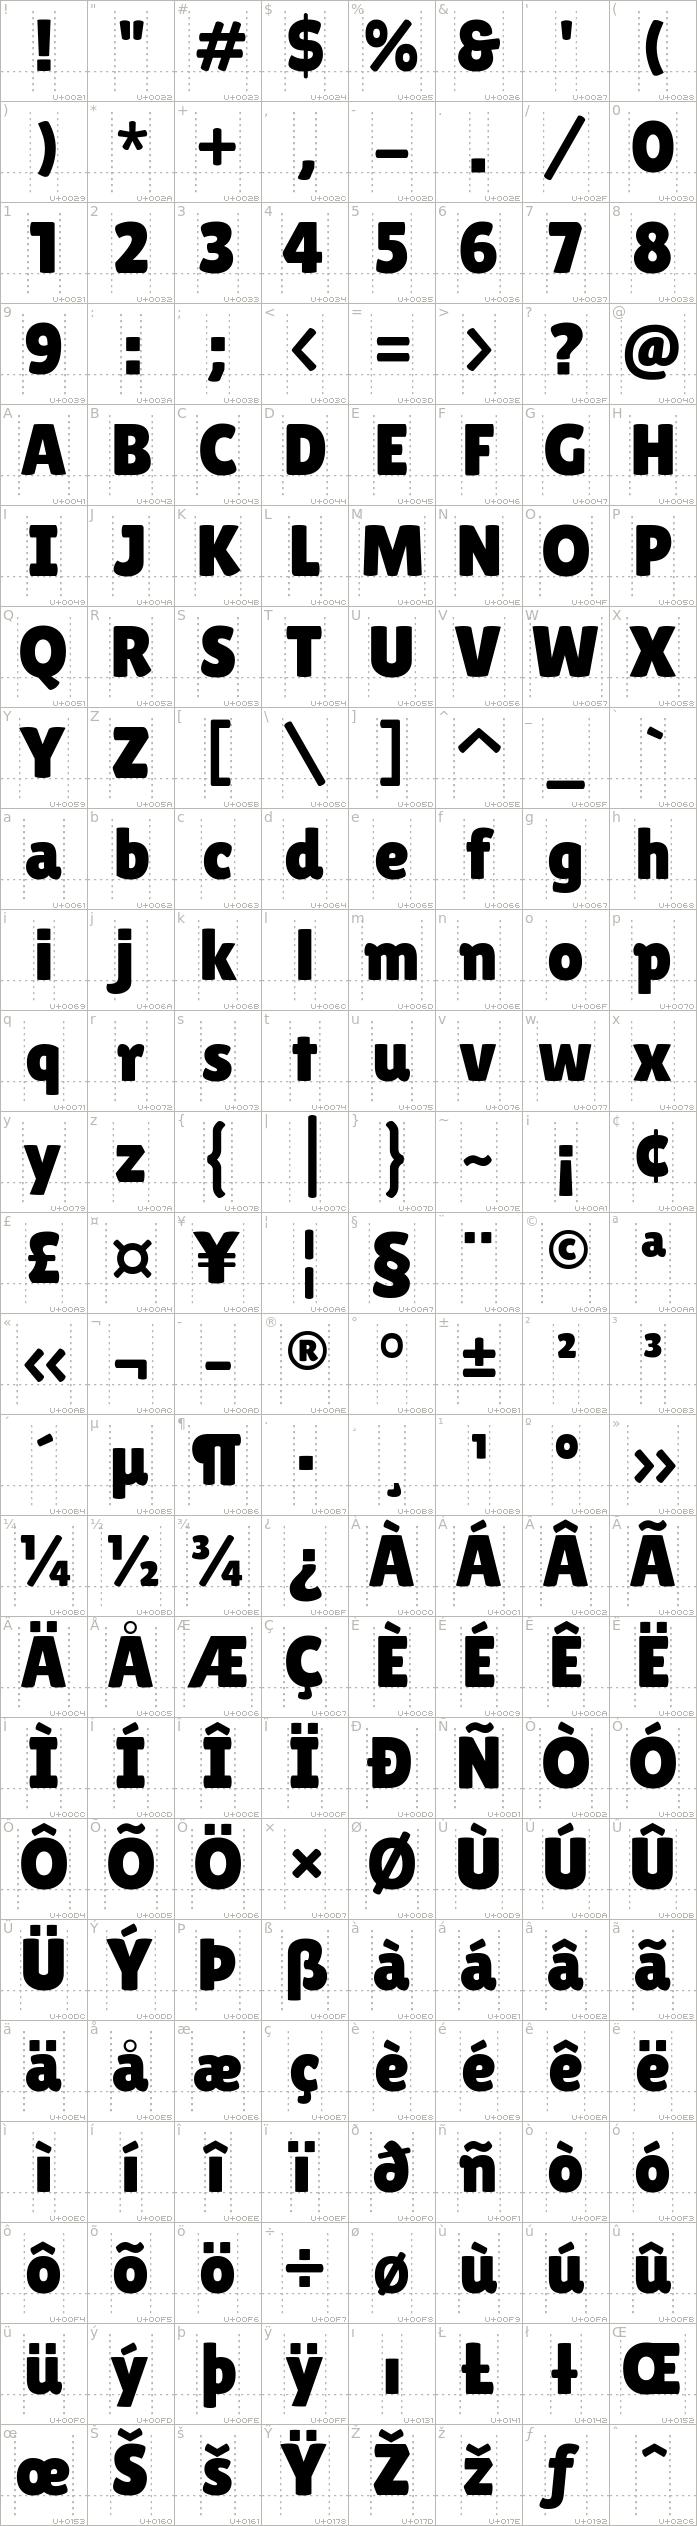 lilita-one.regular.character-map-1